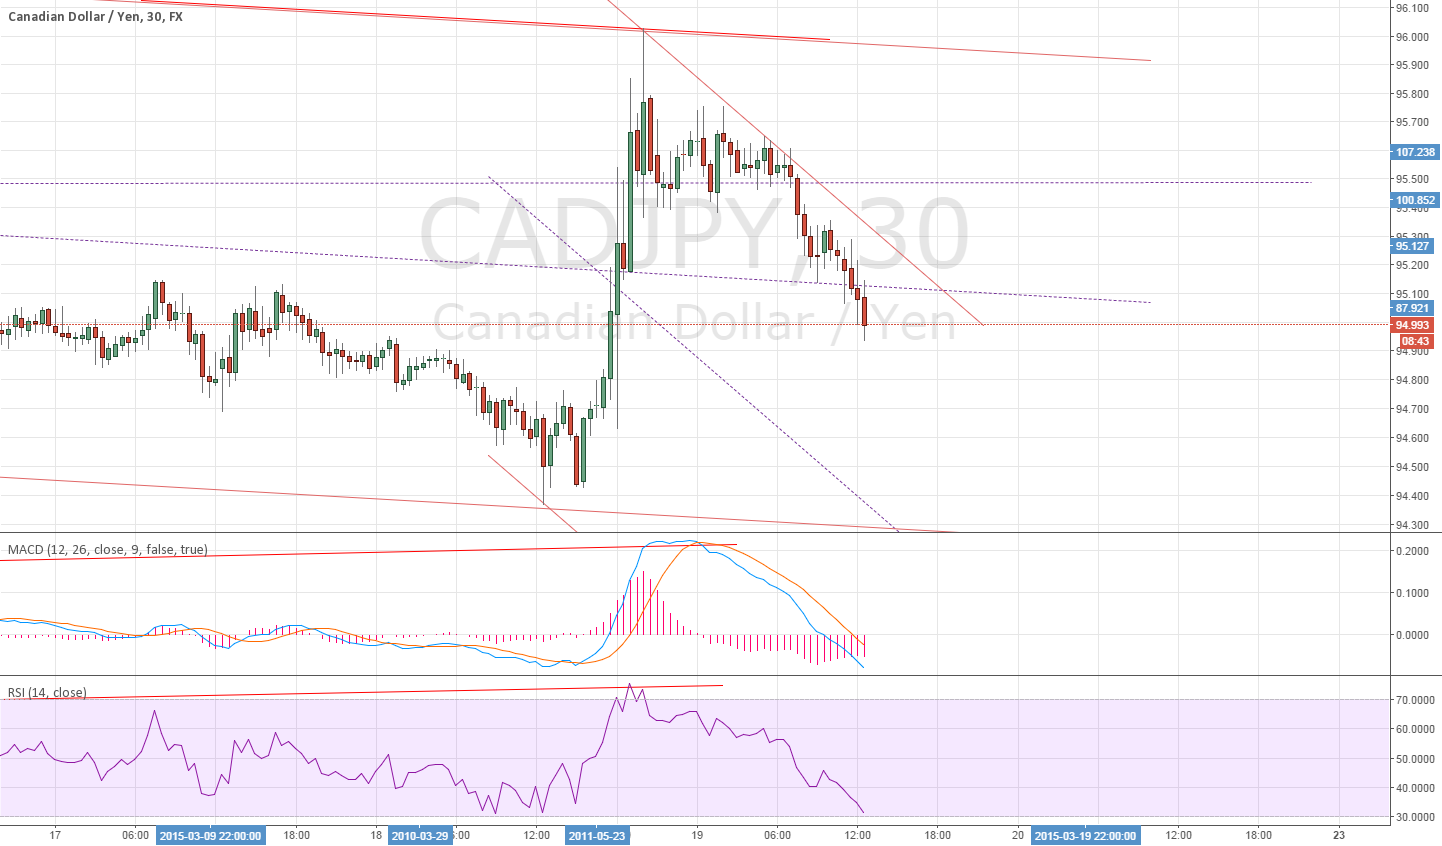 30 Min for CADJPY divergence - No >_<